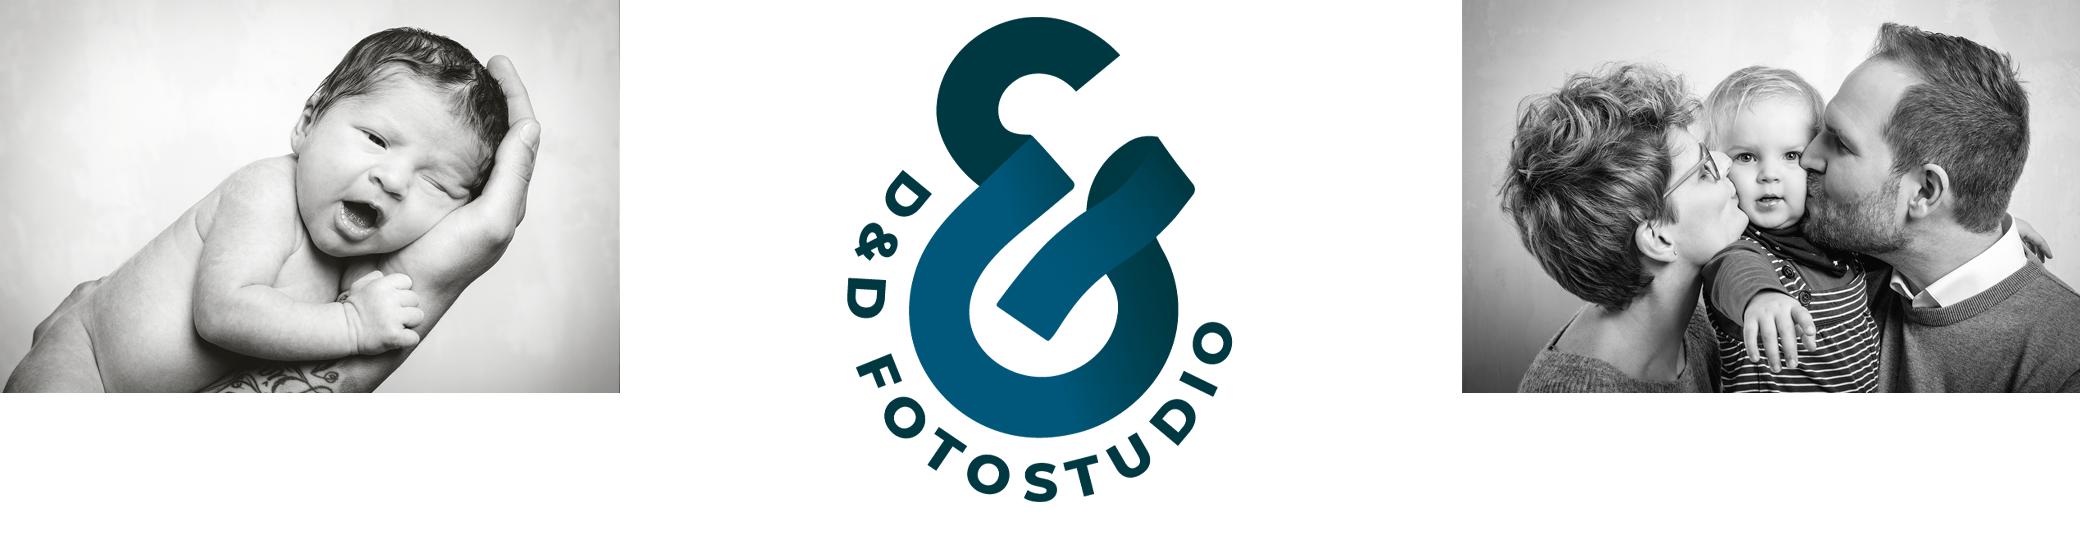 d & d Fotostudio Herford, Passfoto, Bewerbungsfotos, Familienfotos, Fotoshootings, Hochzeitsfotografie